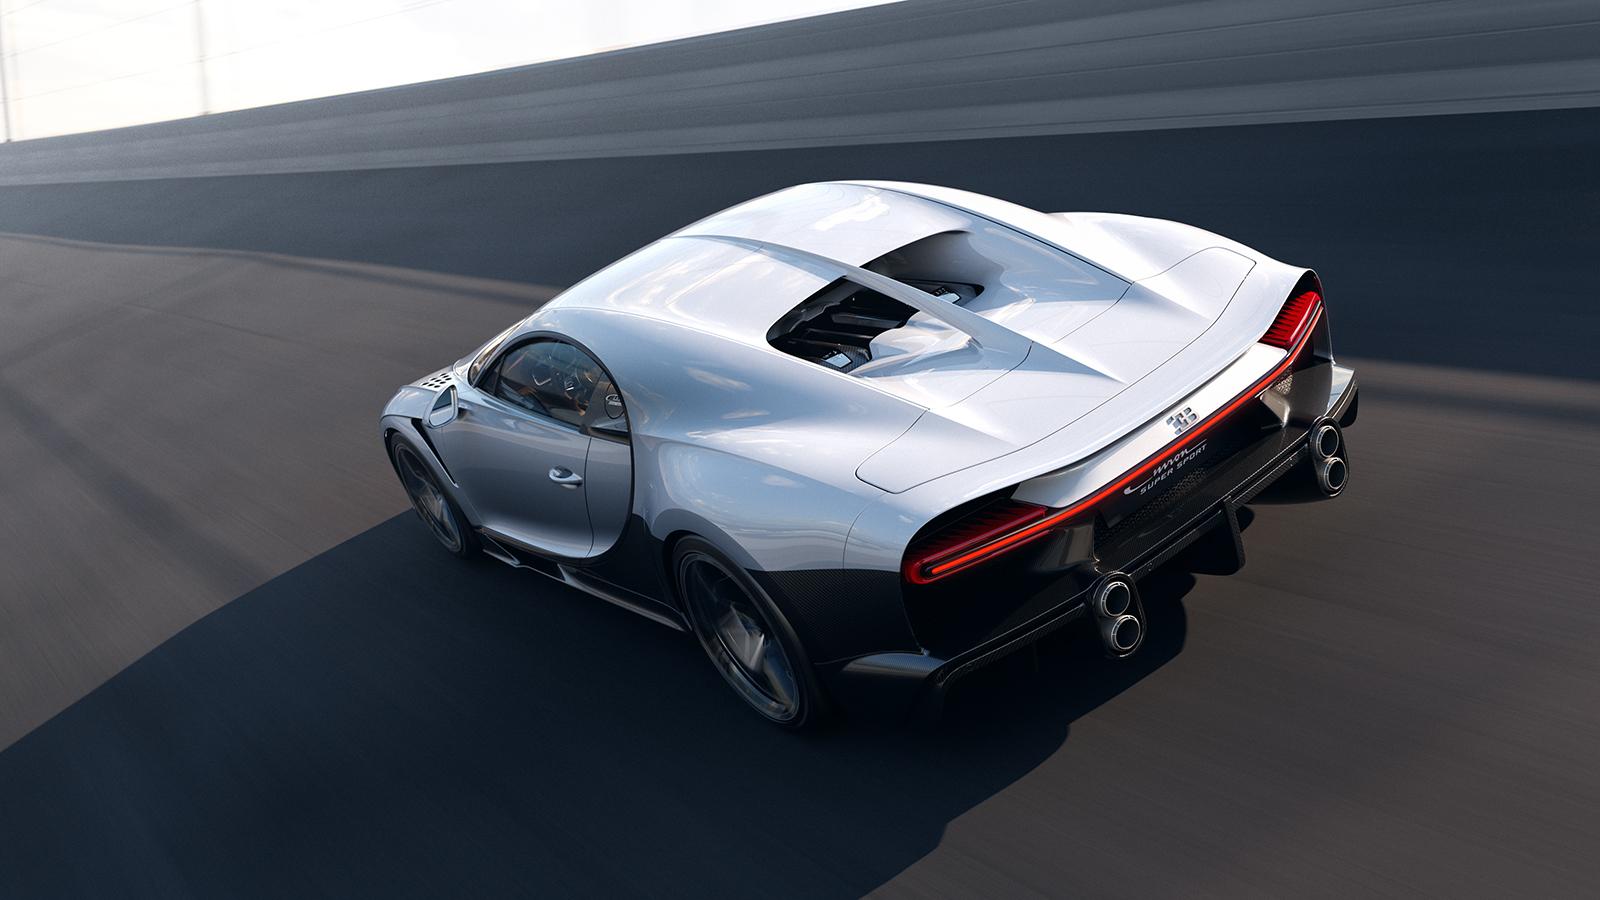 02_08_bugatti_chiron_super_sport_high_speed_rear.jpeg